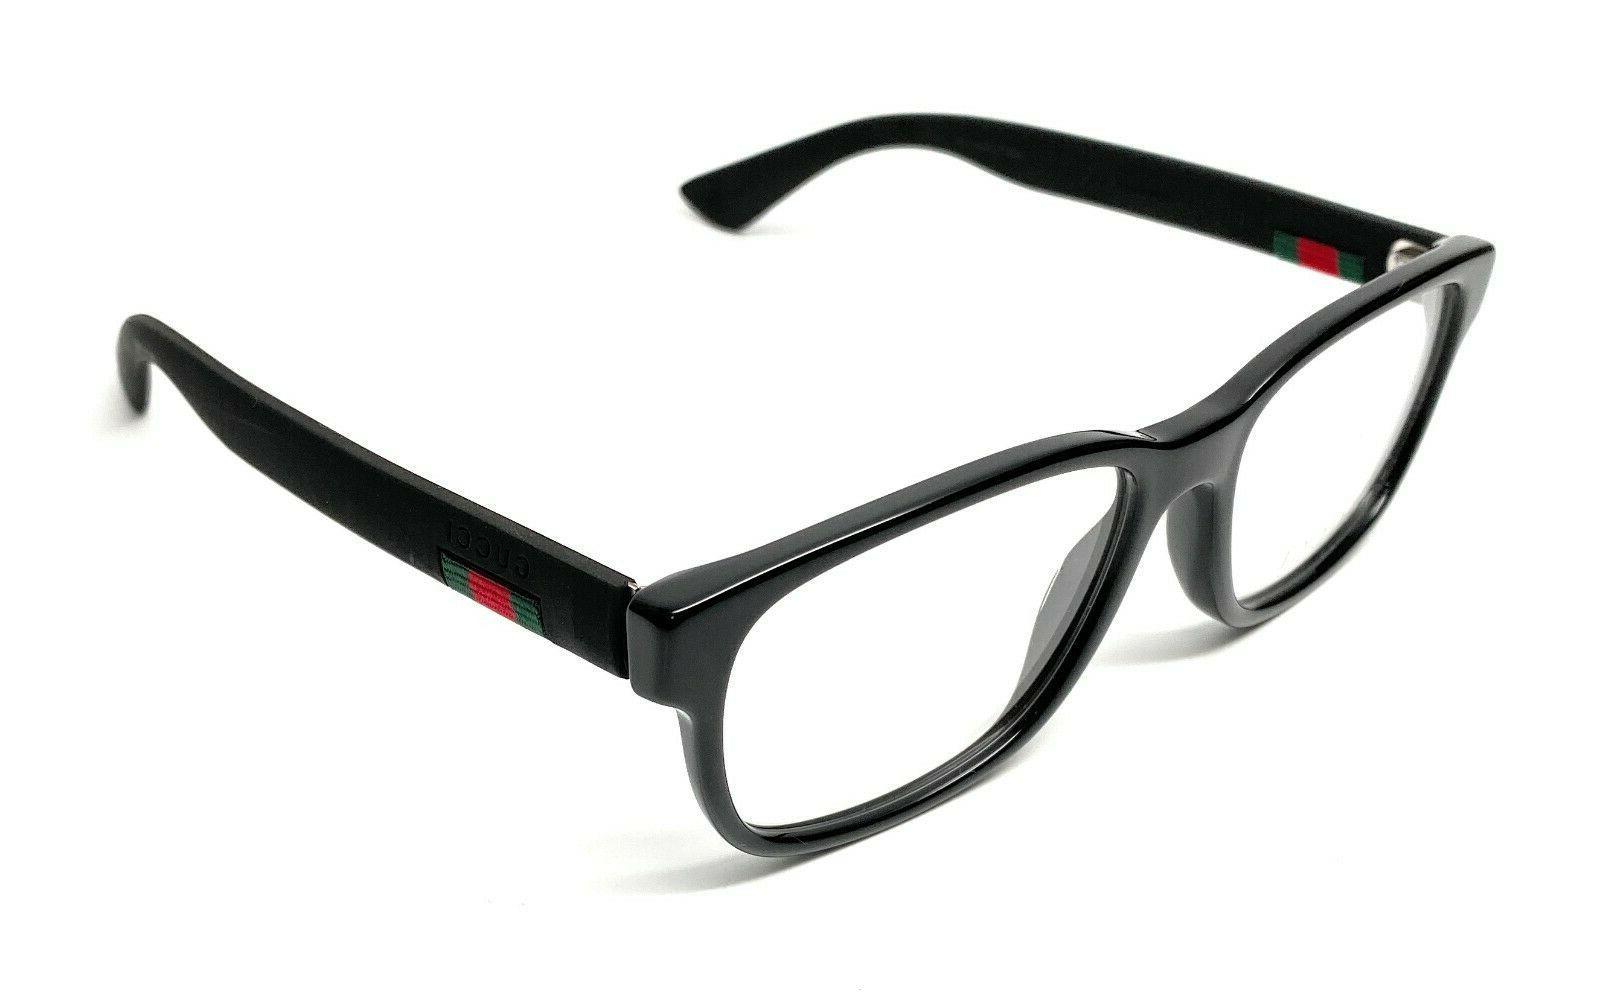 authentic 0011o 001 black eyeglass